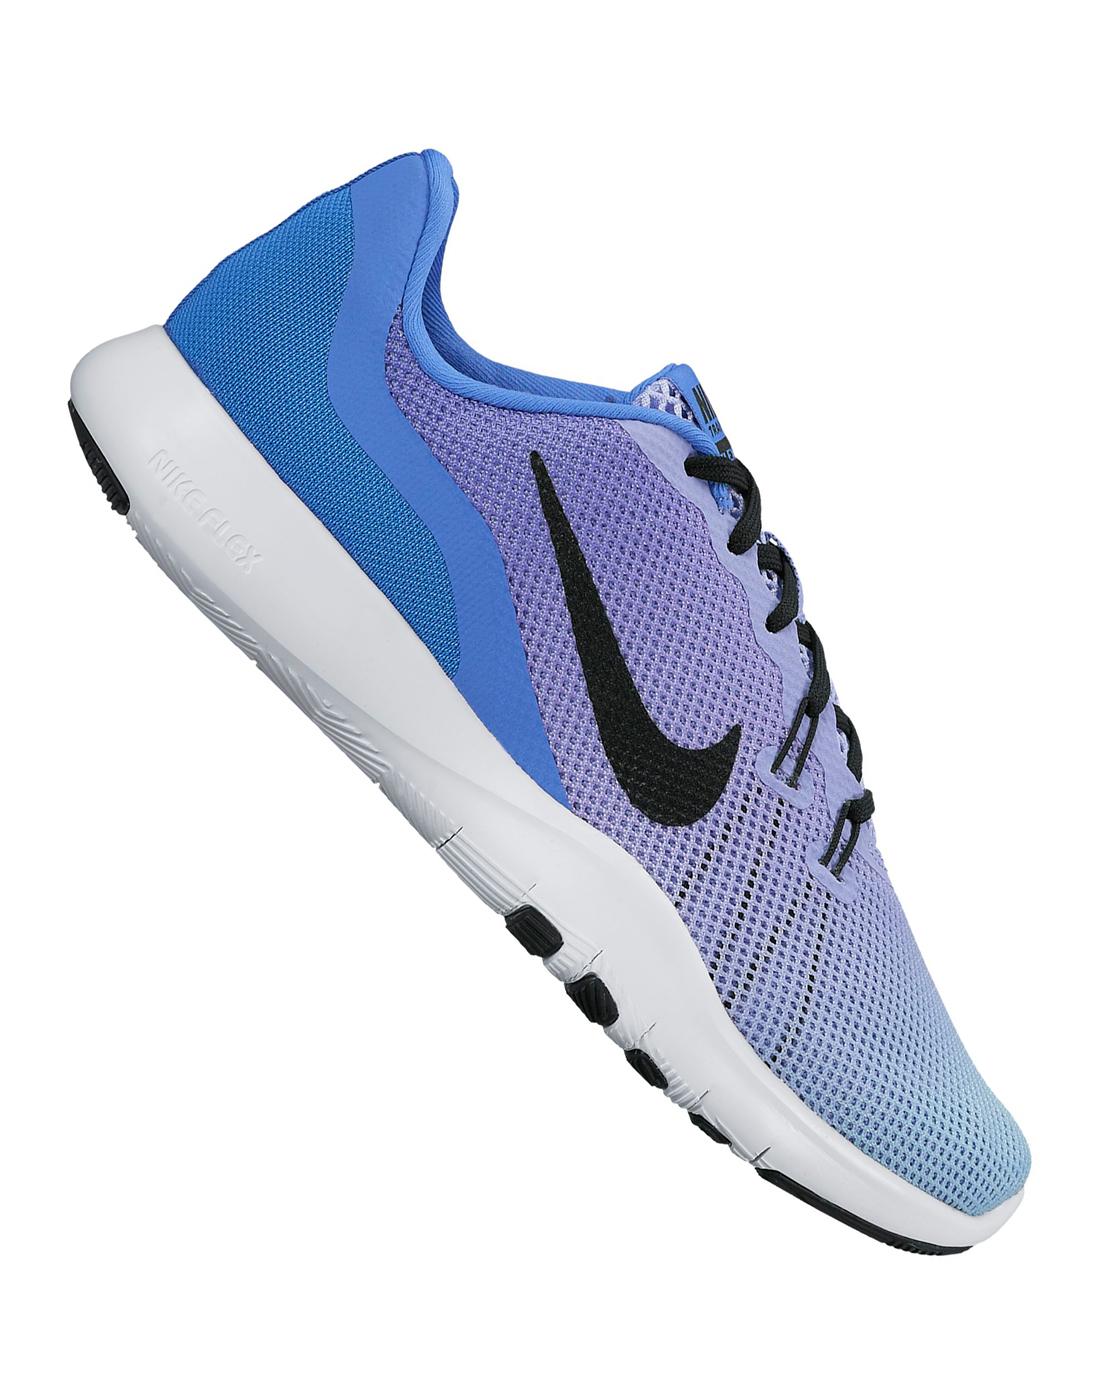 6214e02c7e11f Nike Womens Flex Trainer 7 Fade | Life Style Sports